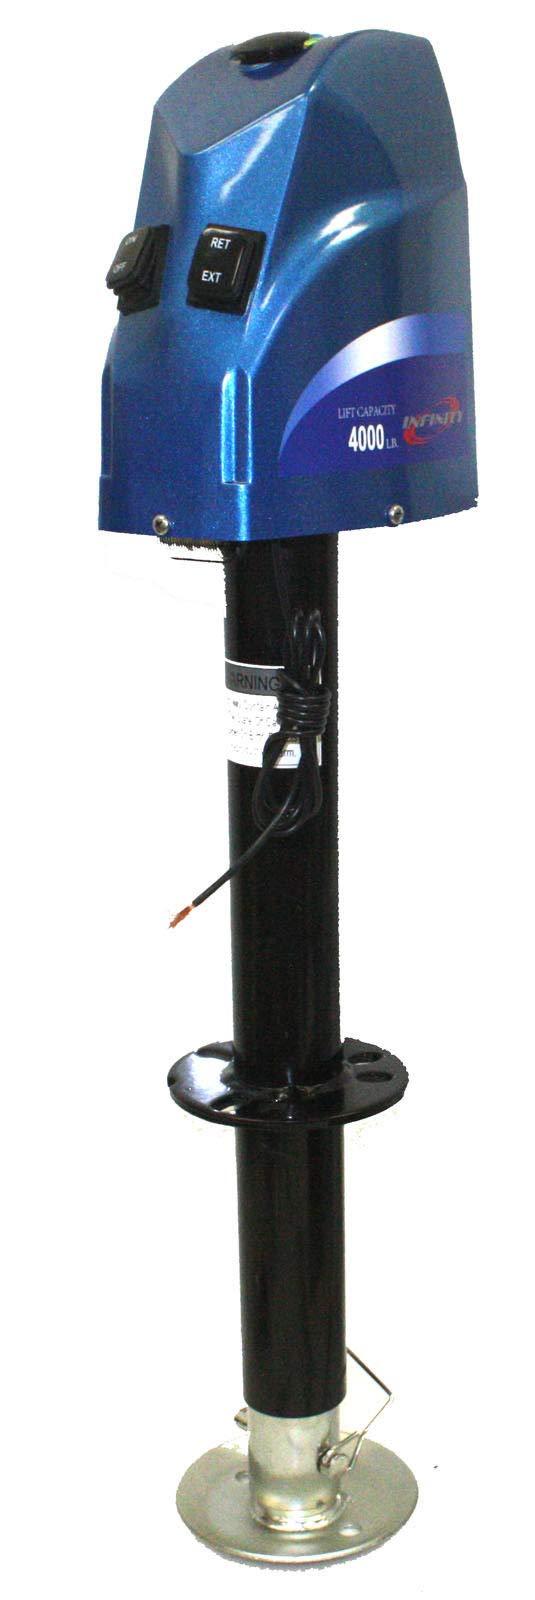 9TRADING A-Frame 12V Electric Trailer Lift Jack 4,000lbs 14'' Lift Tongue Jack RV Trailer